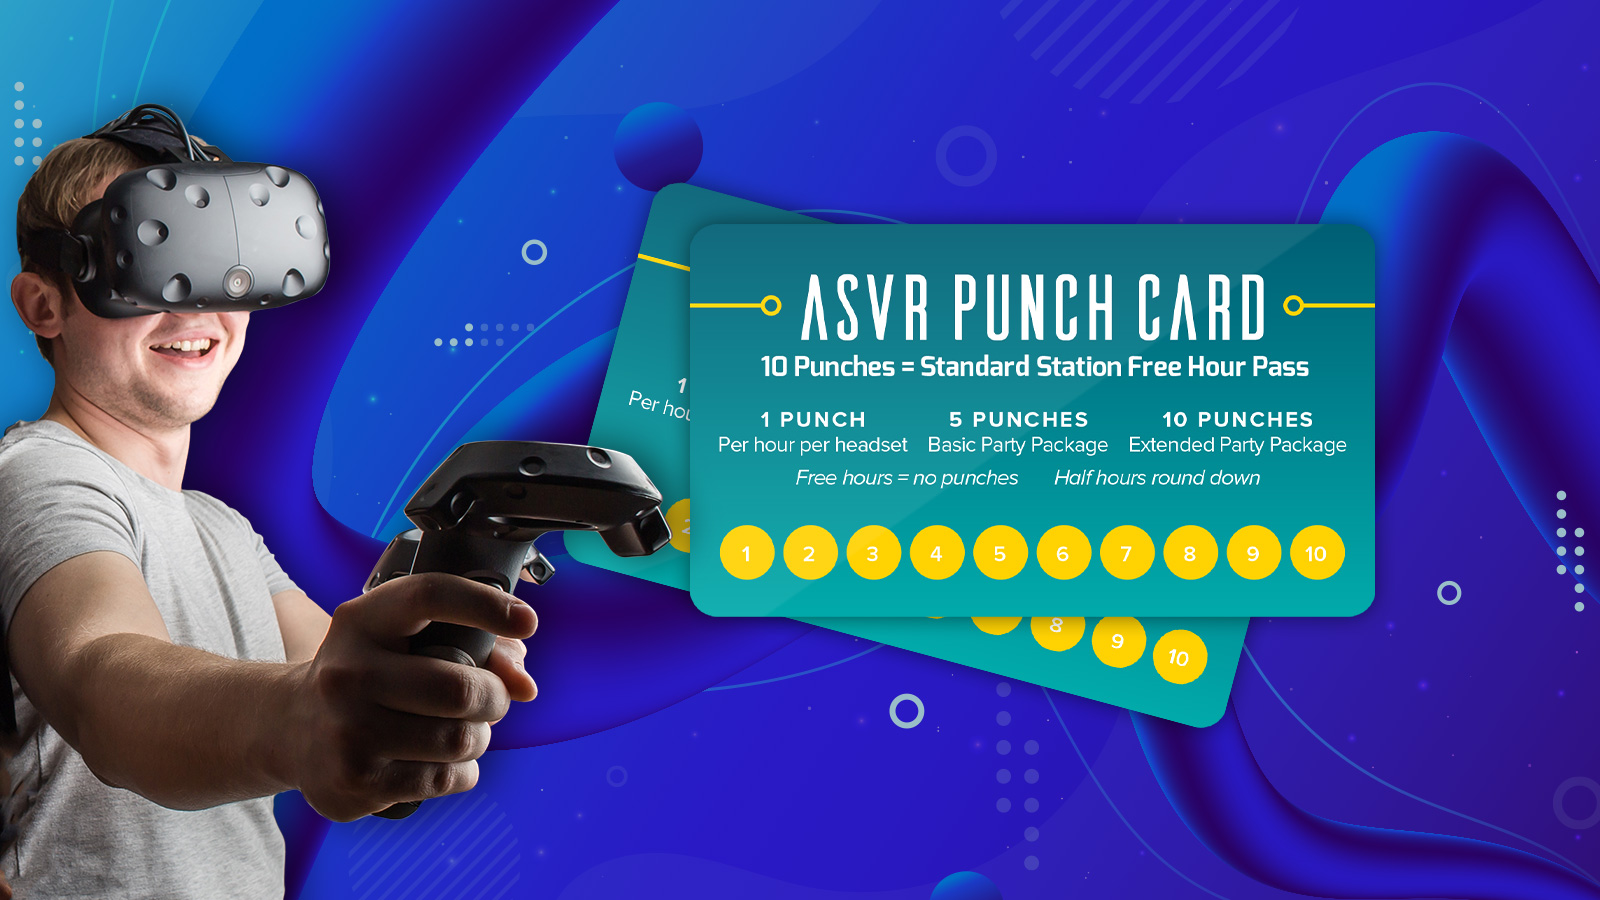 ASVR-Punch-Card-Blog-V2.jpg